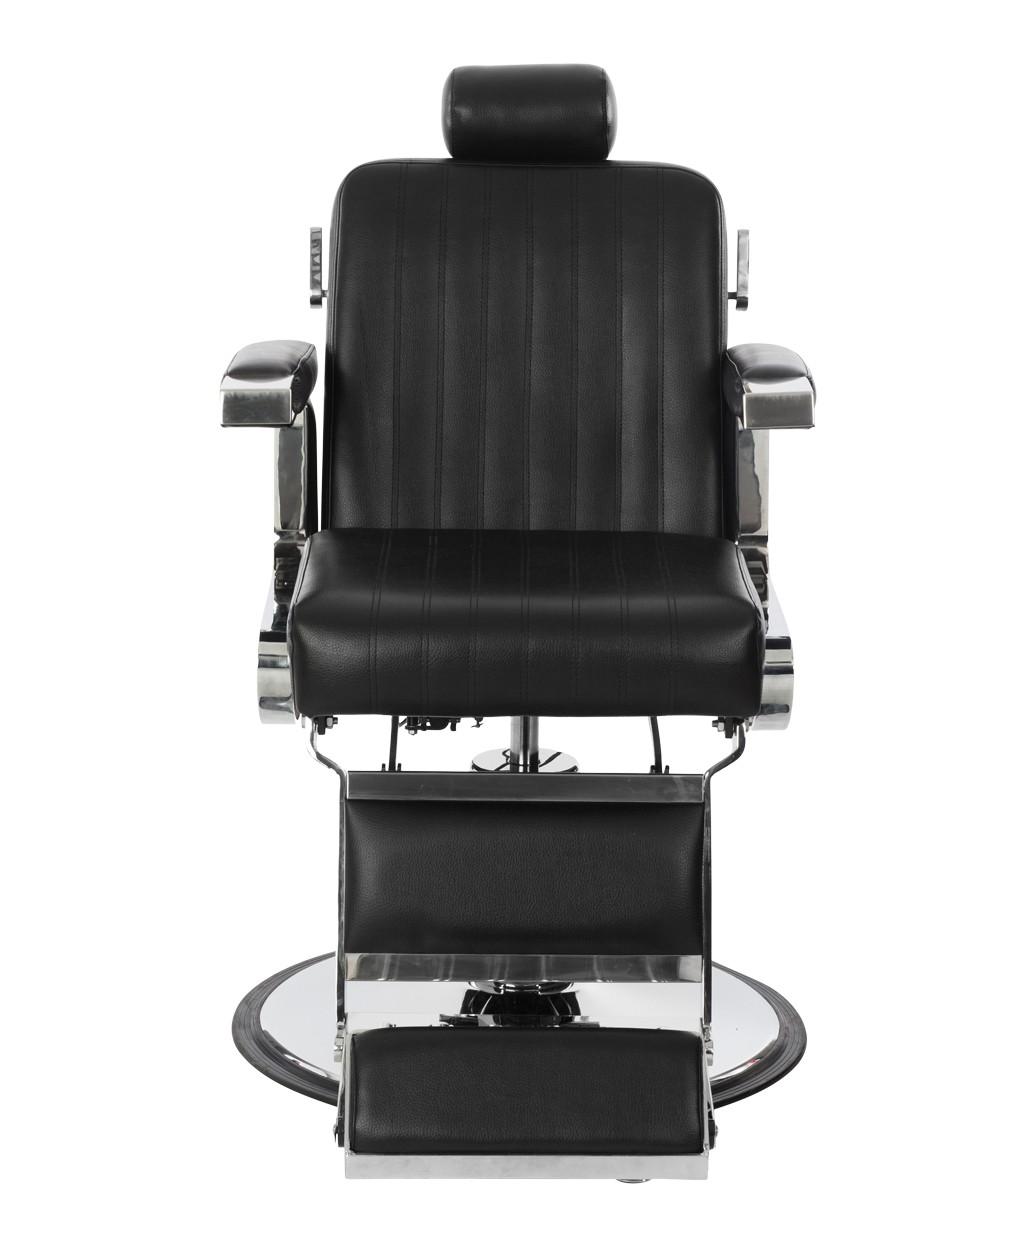 professional barber chair reviews bean bag manufacturers empire